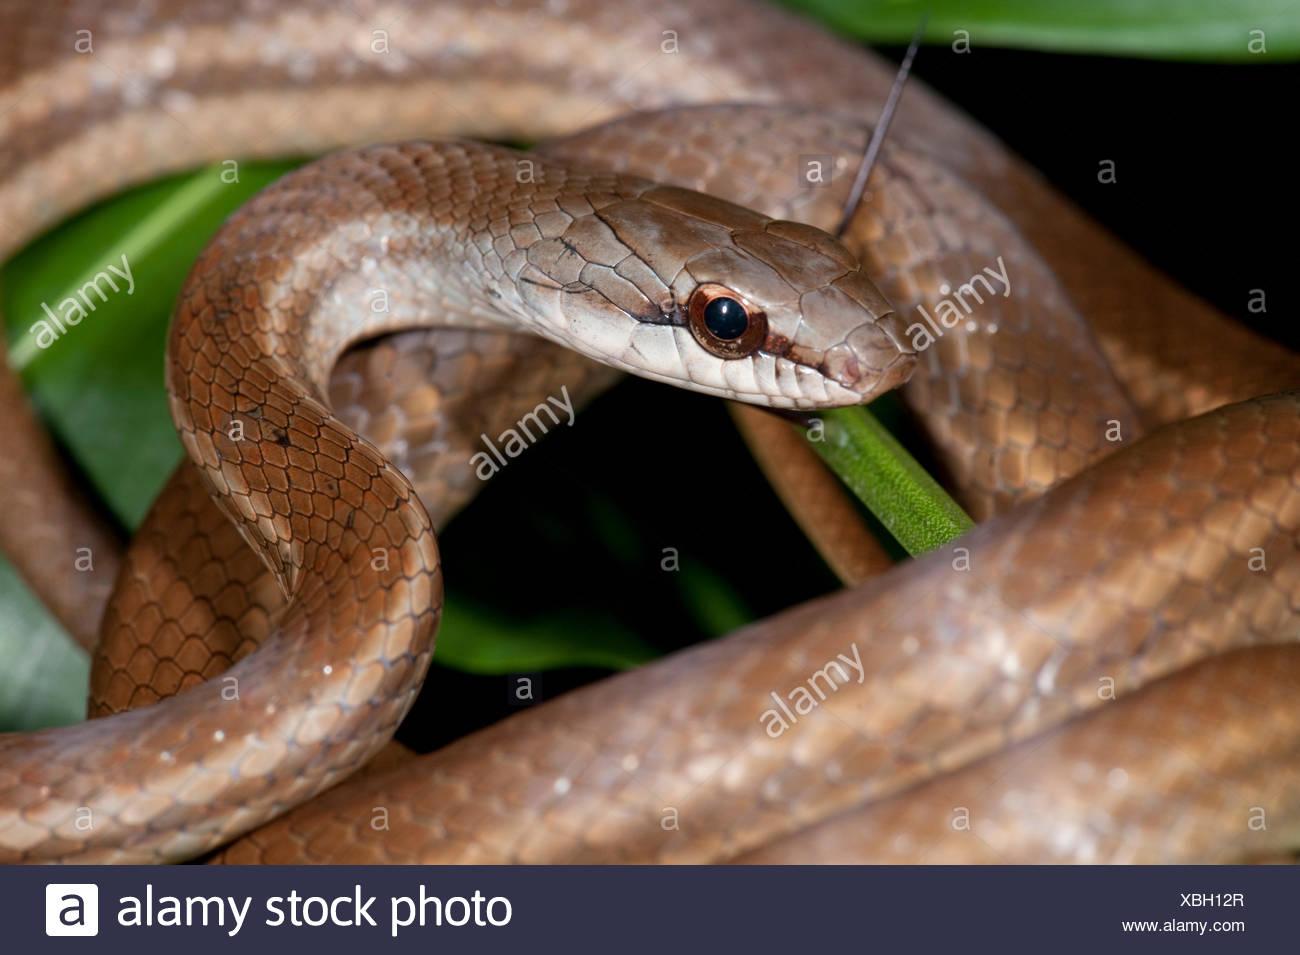 Salmon Bellied Racer Snake Dryadophis Melanolomus Panama Central America Gamboa Reserve